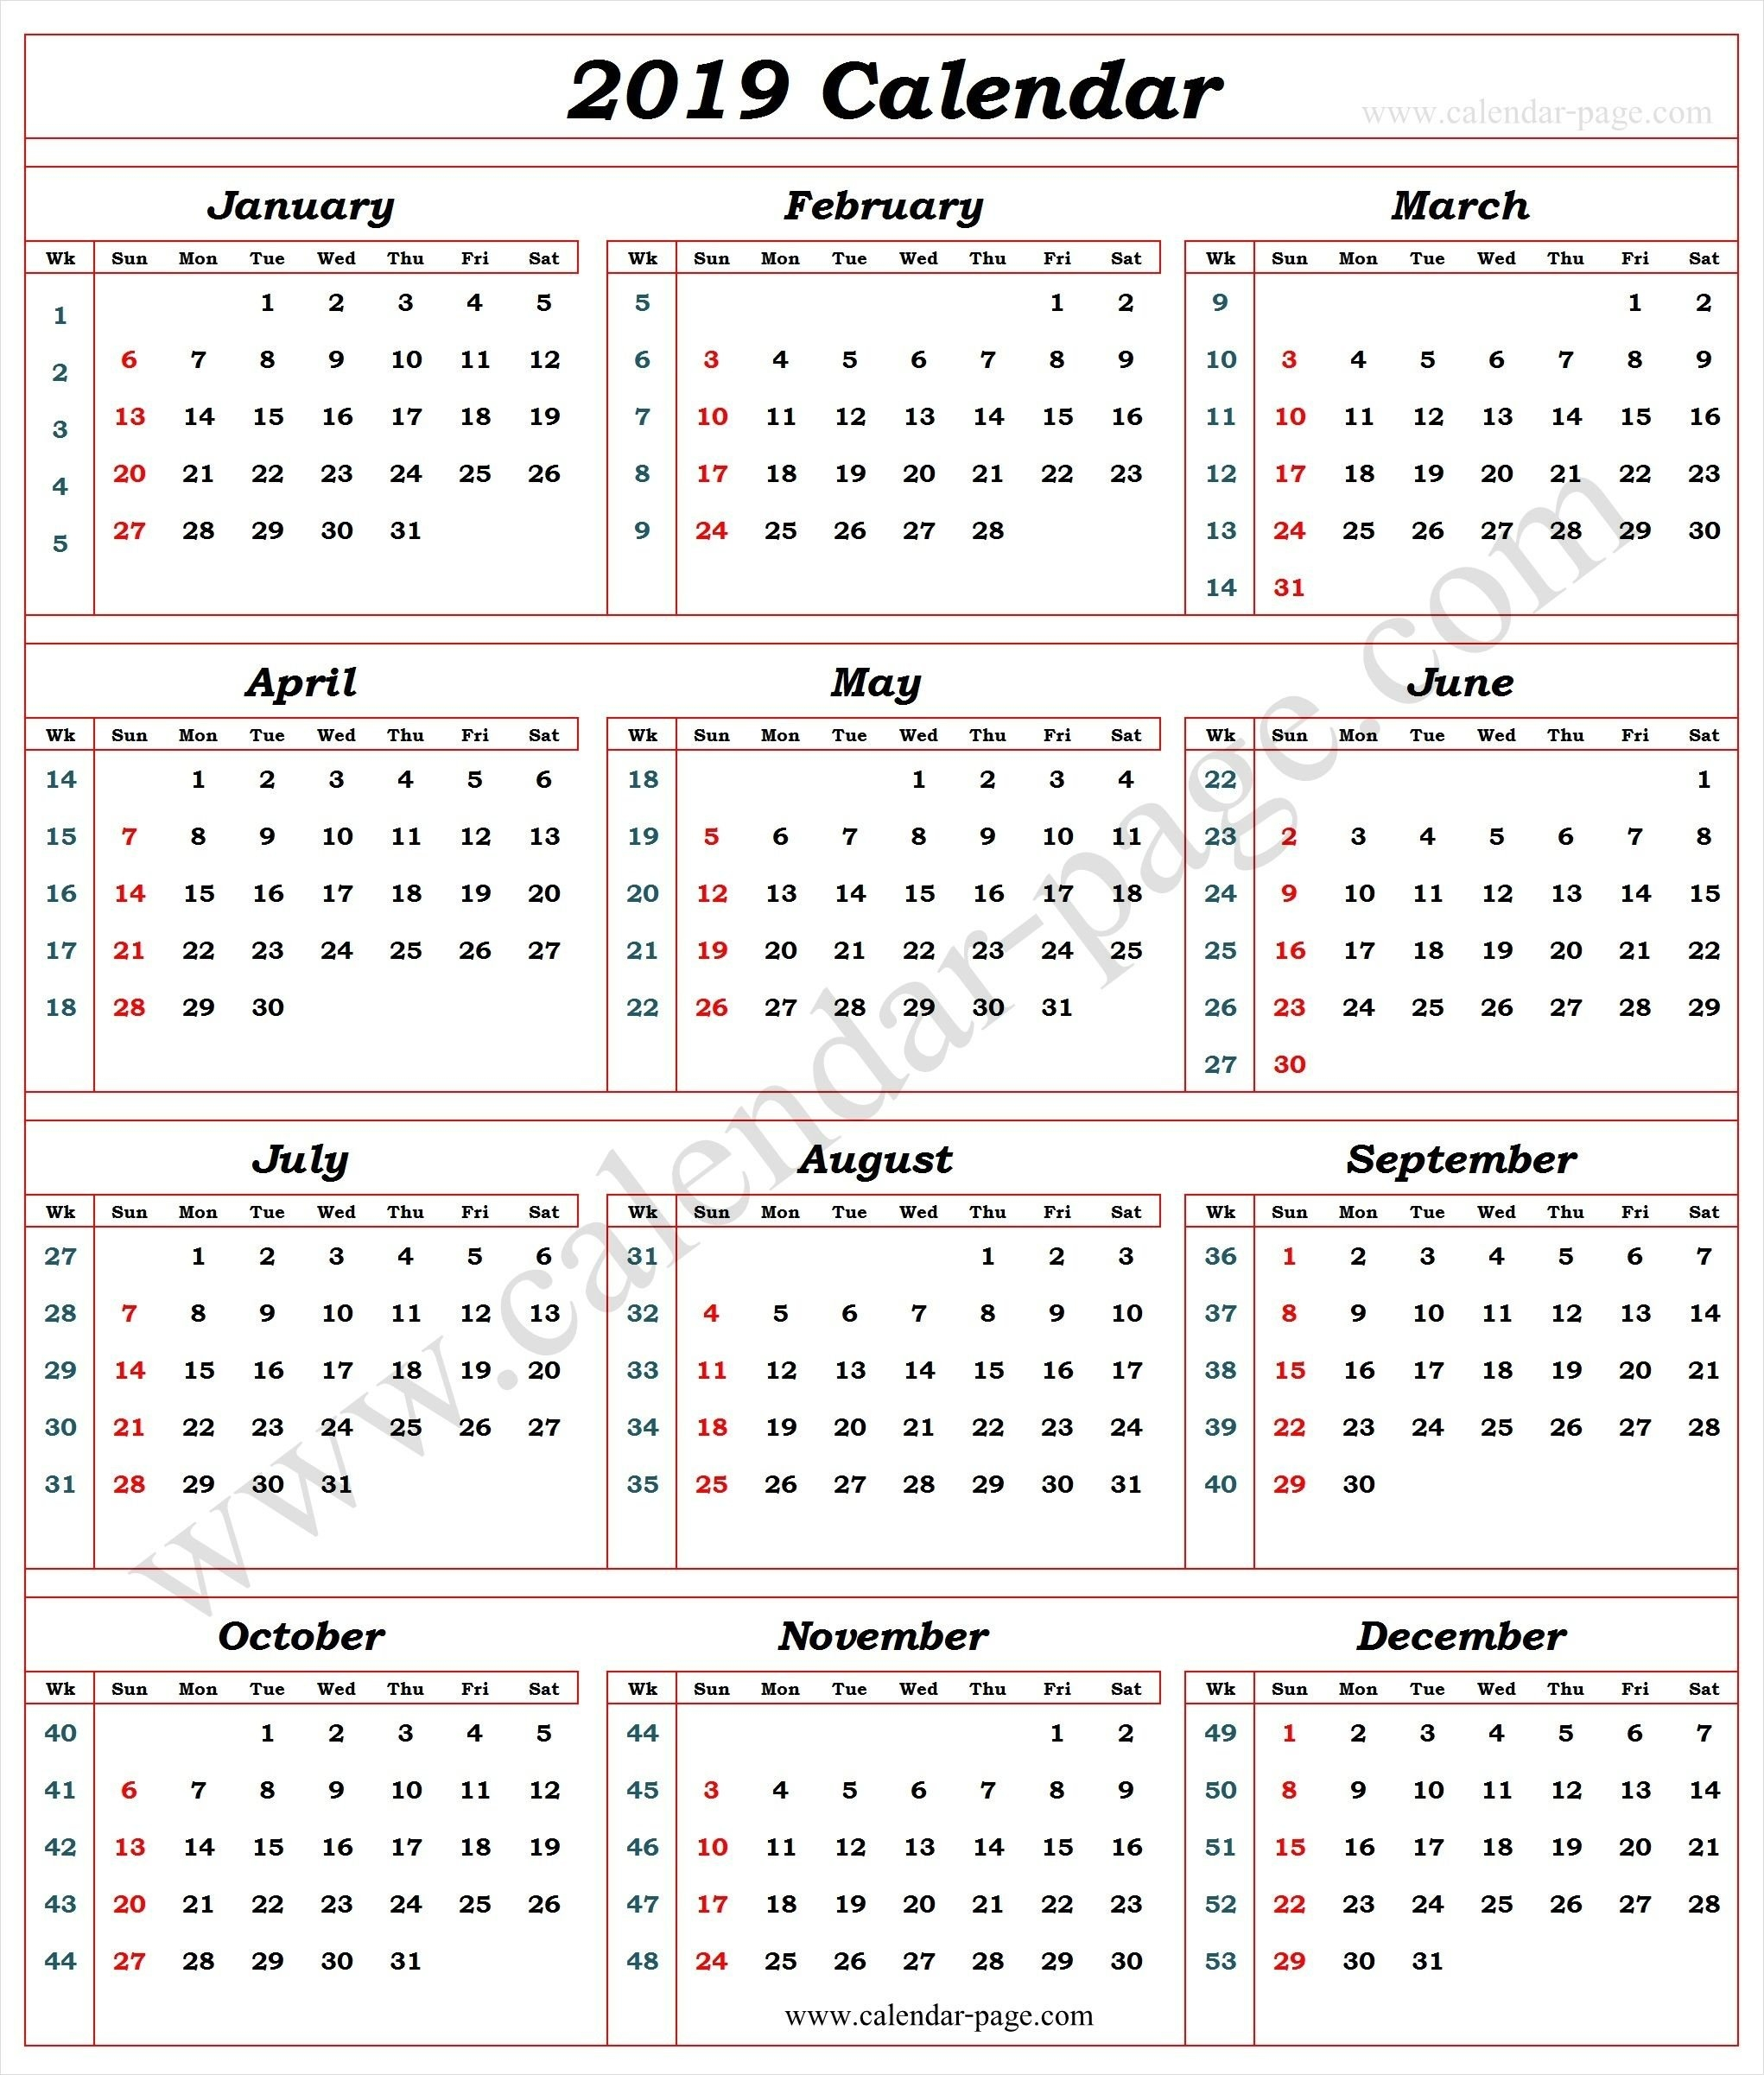 Calendar 2019 With Week Numbers   2019 Calendar Template   Pinterest Calendar Week 16 2019